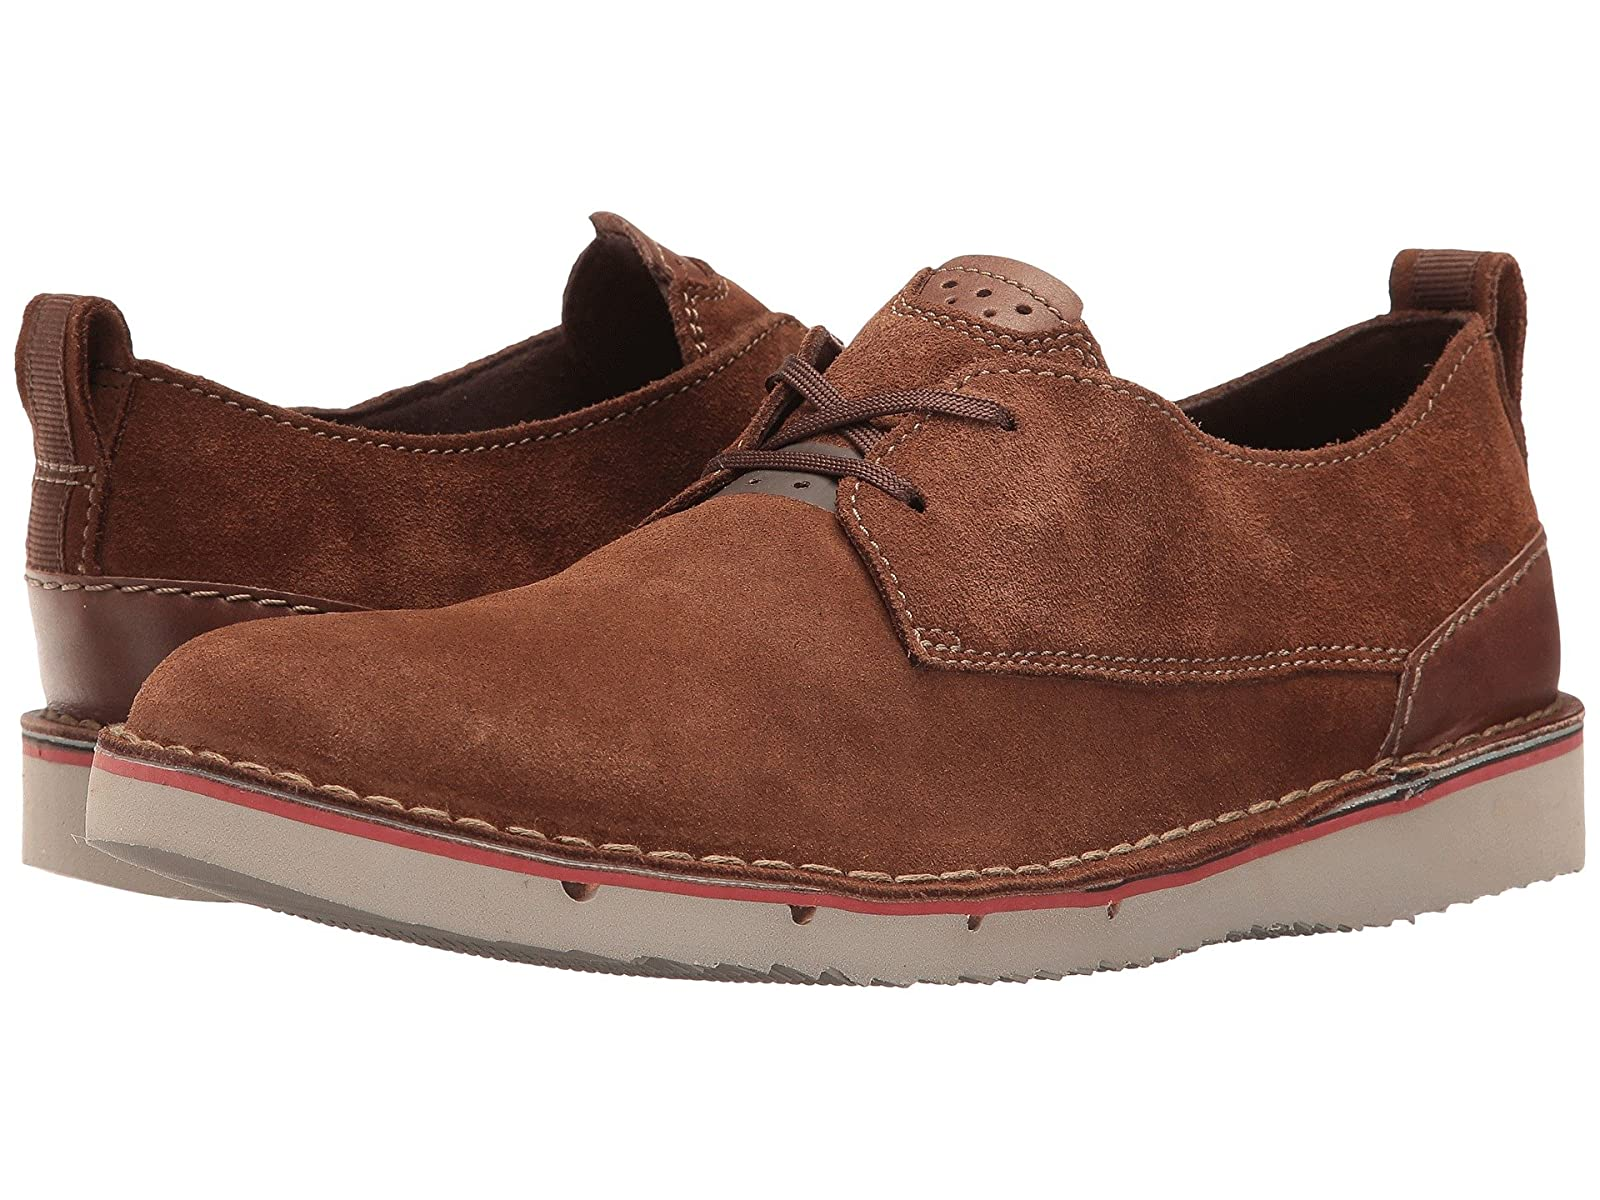 Clarks Capler PlainCheap and distinctive eye-catching shoes